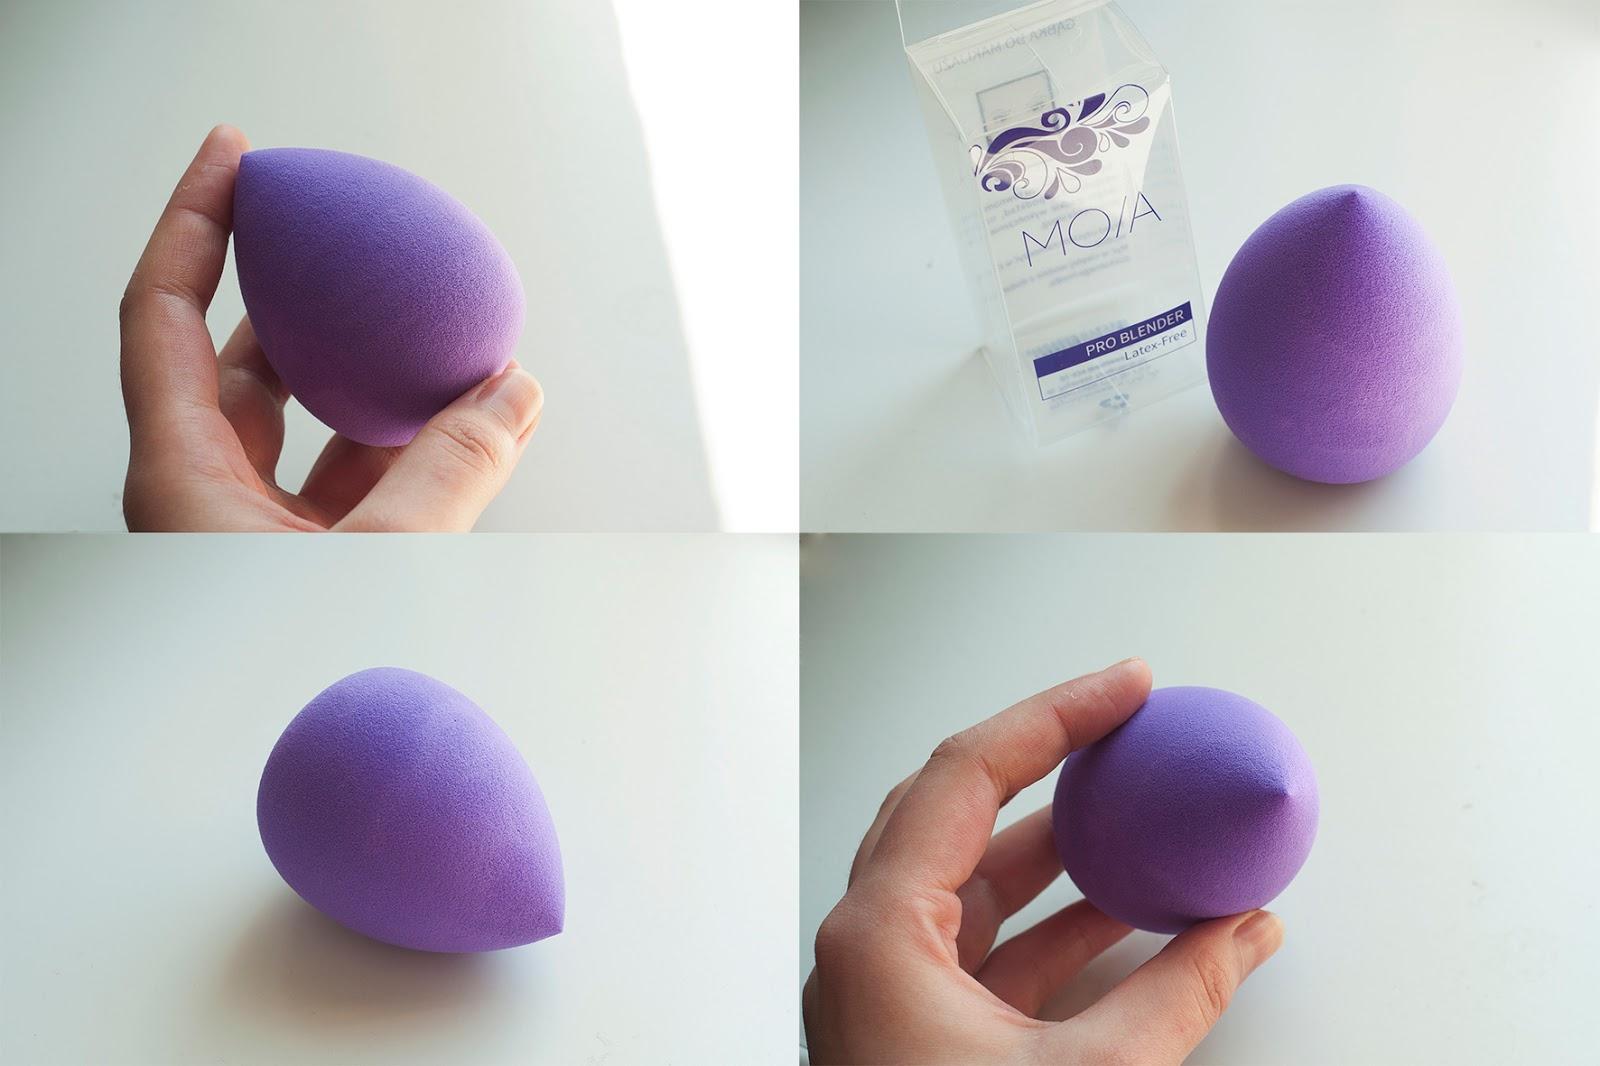 fioletowa gabka kontigo